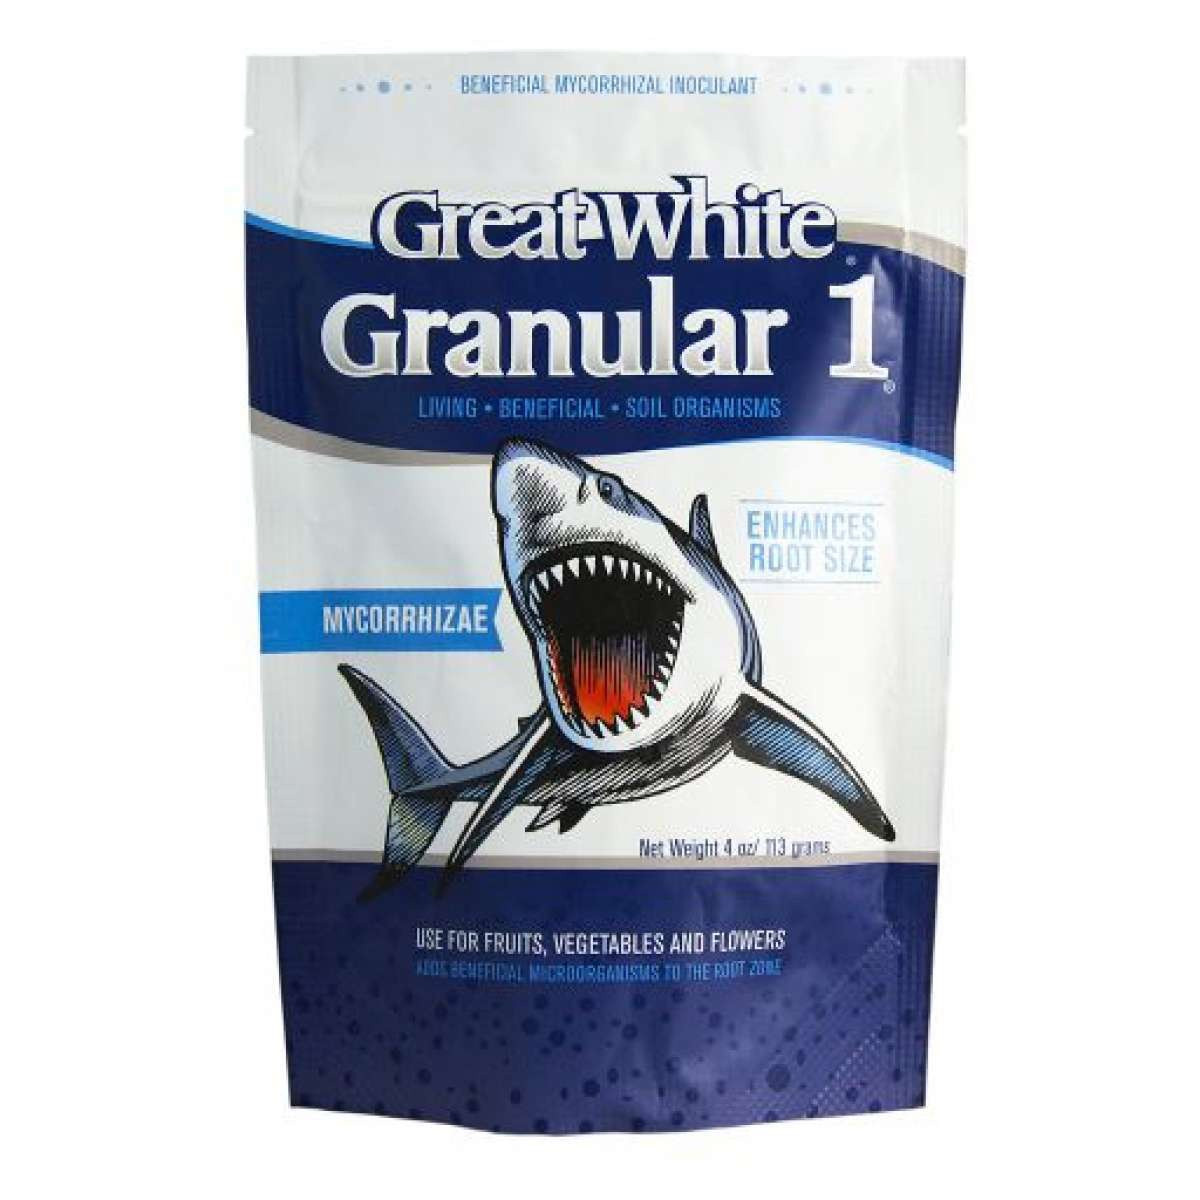 GREAT WHITE GRANULAR ONE 4oz